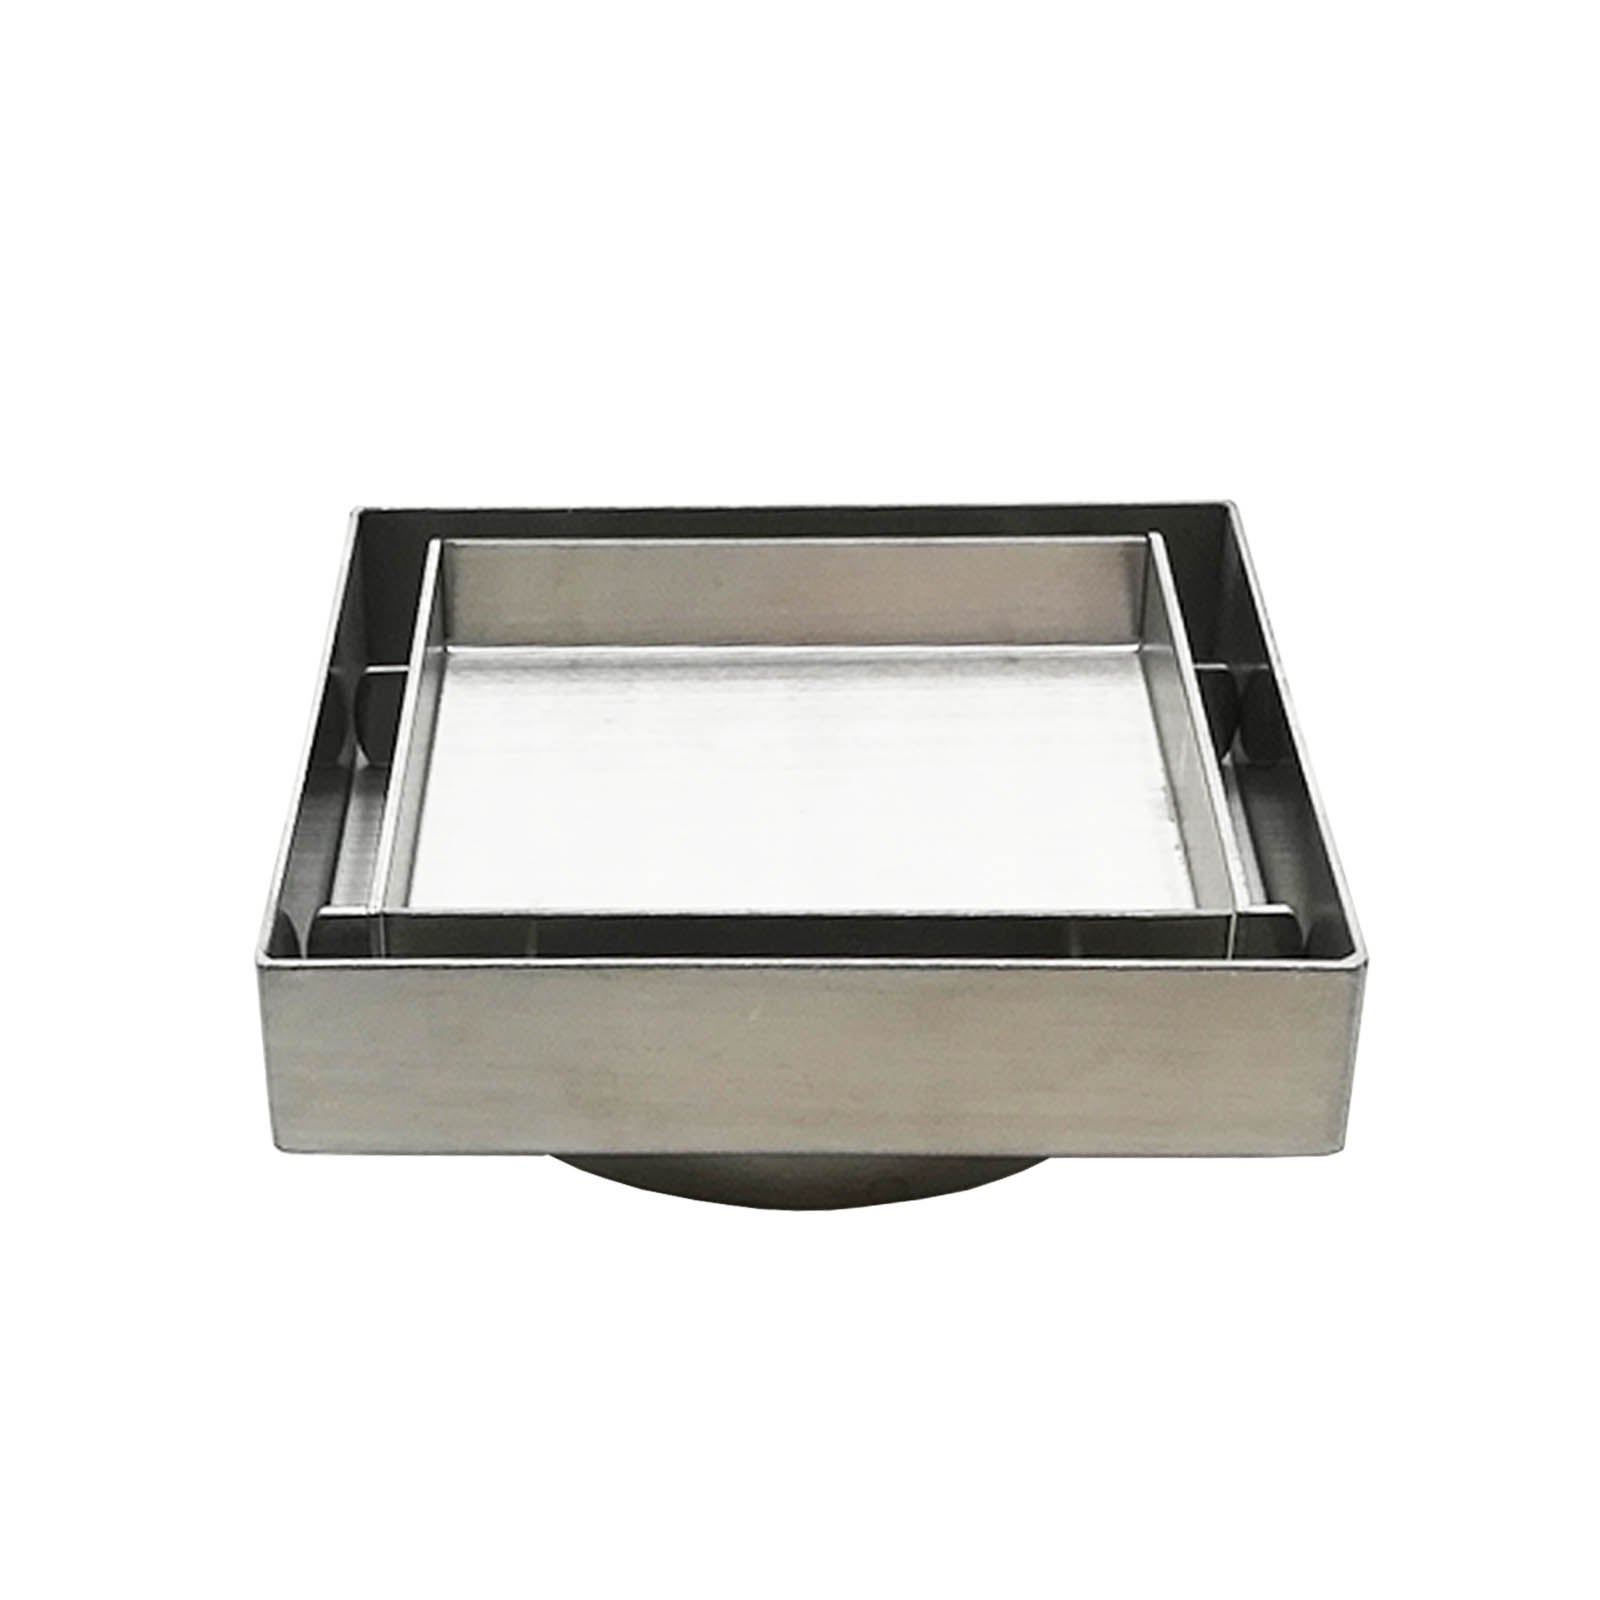 Brushed Gold PVD Stainless Steel Tile Insert 900×80 Floor Waste Panel Watermark